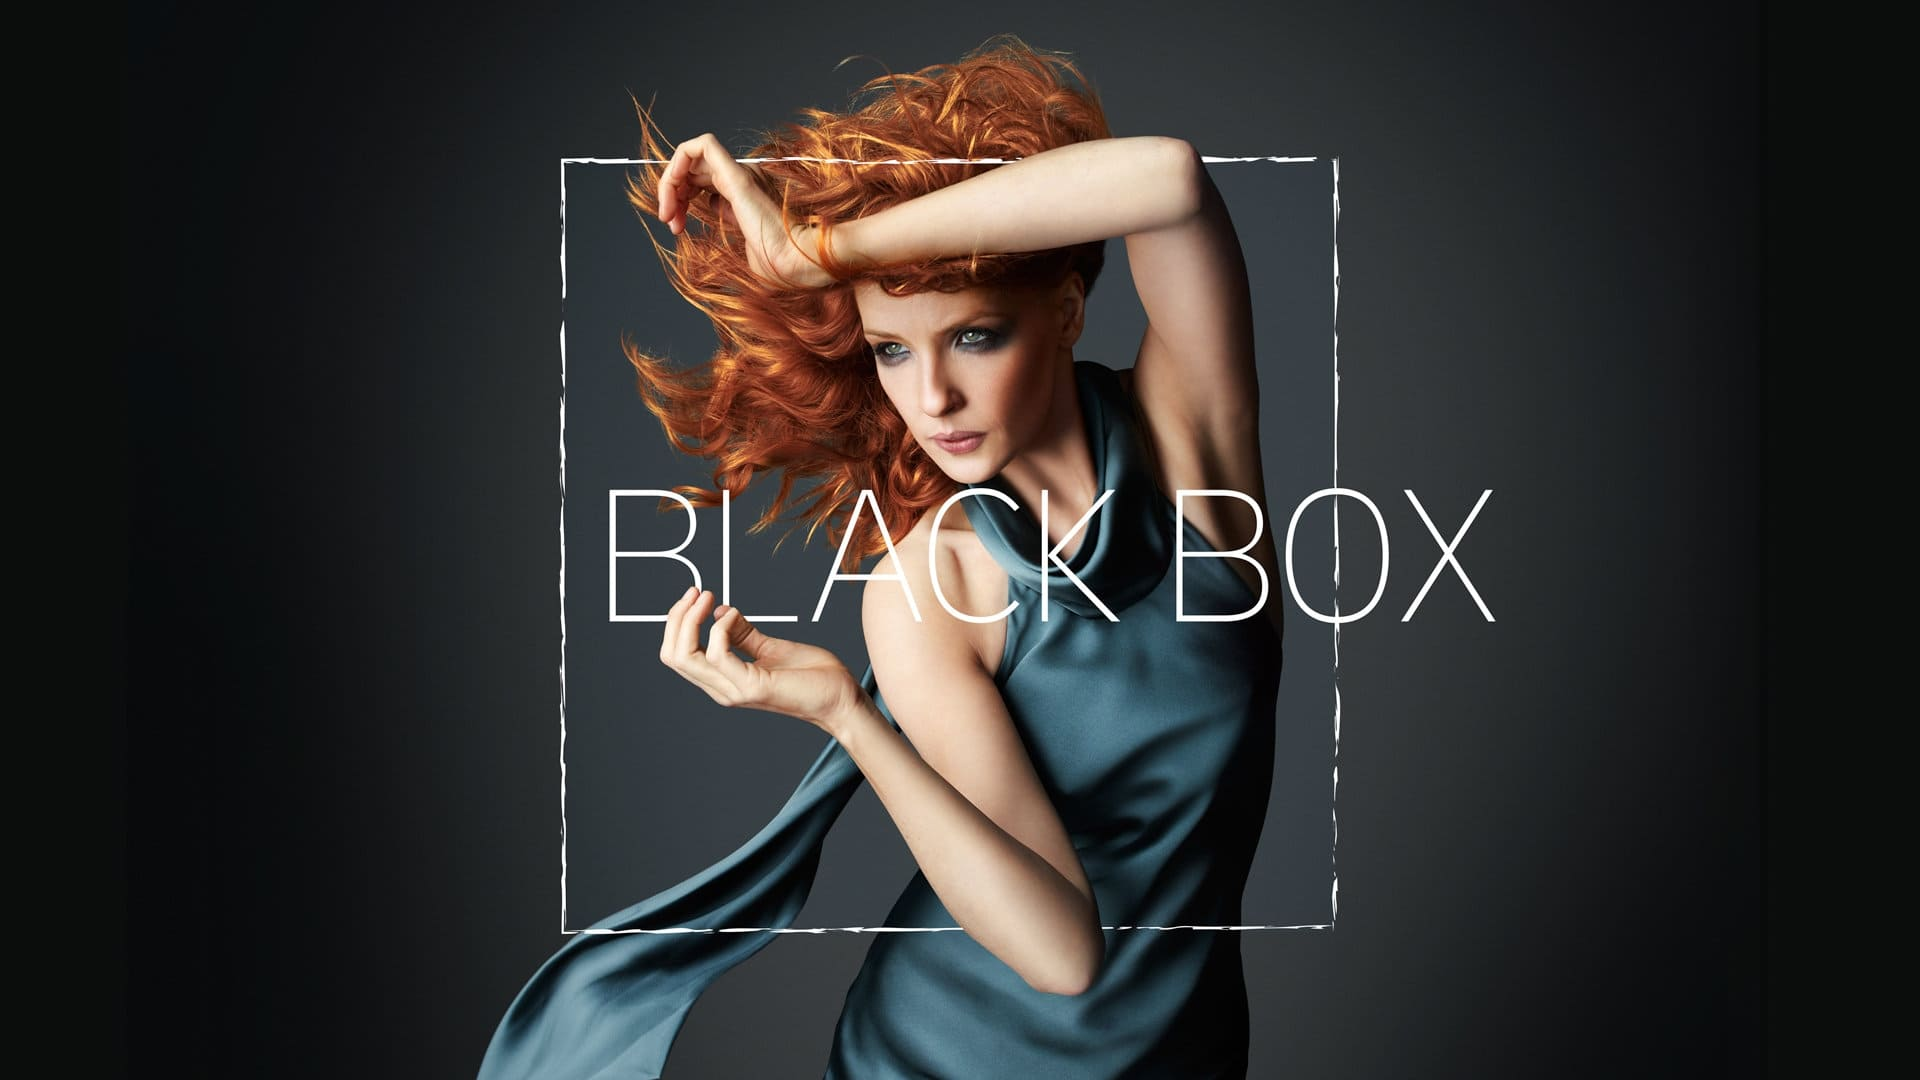 ABC cancelt Black Box